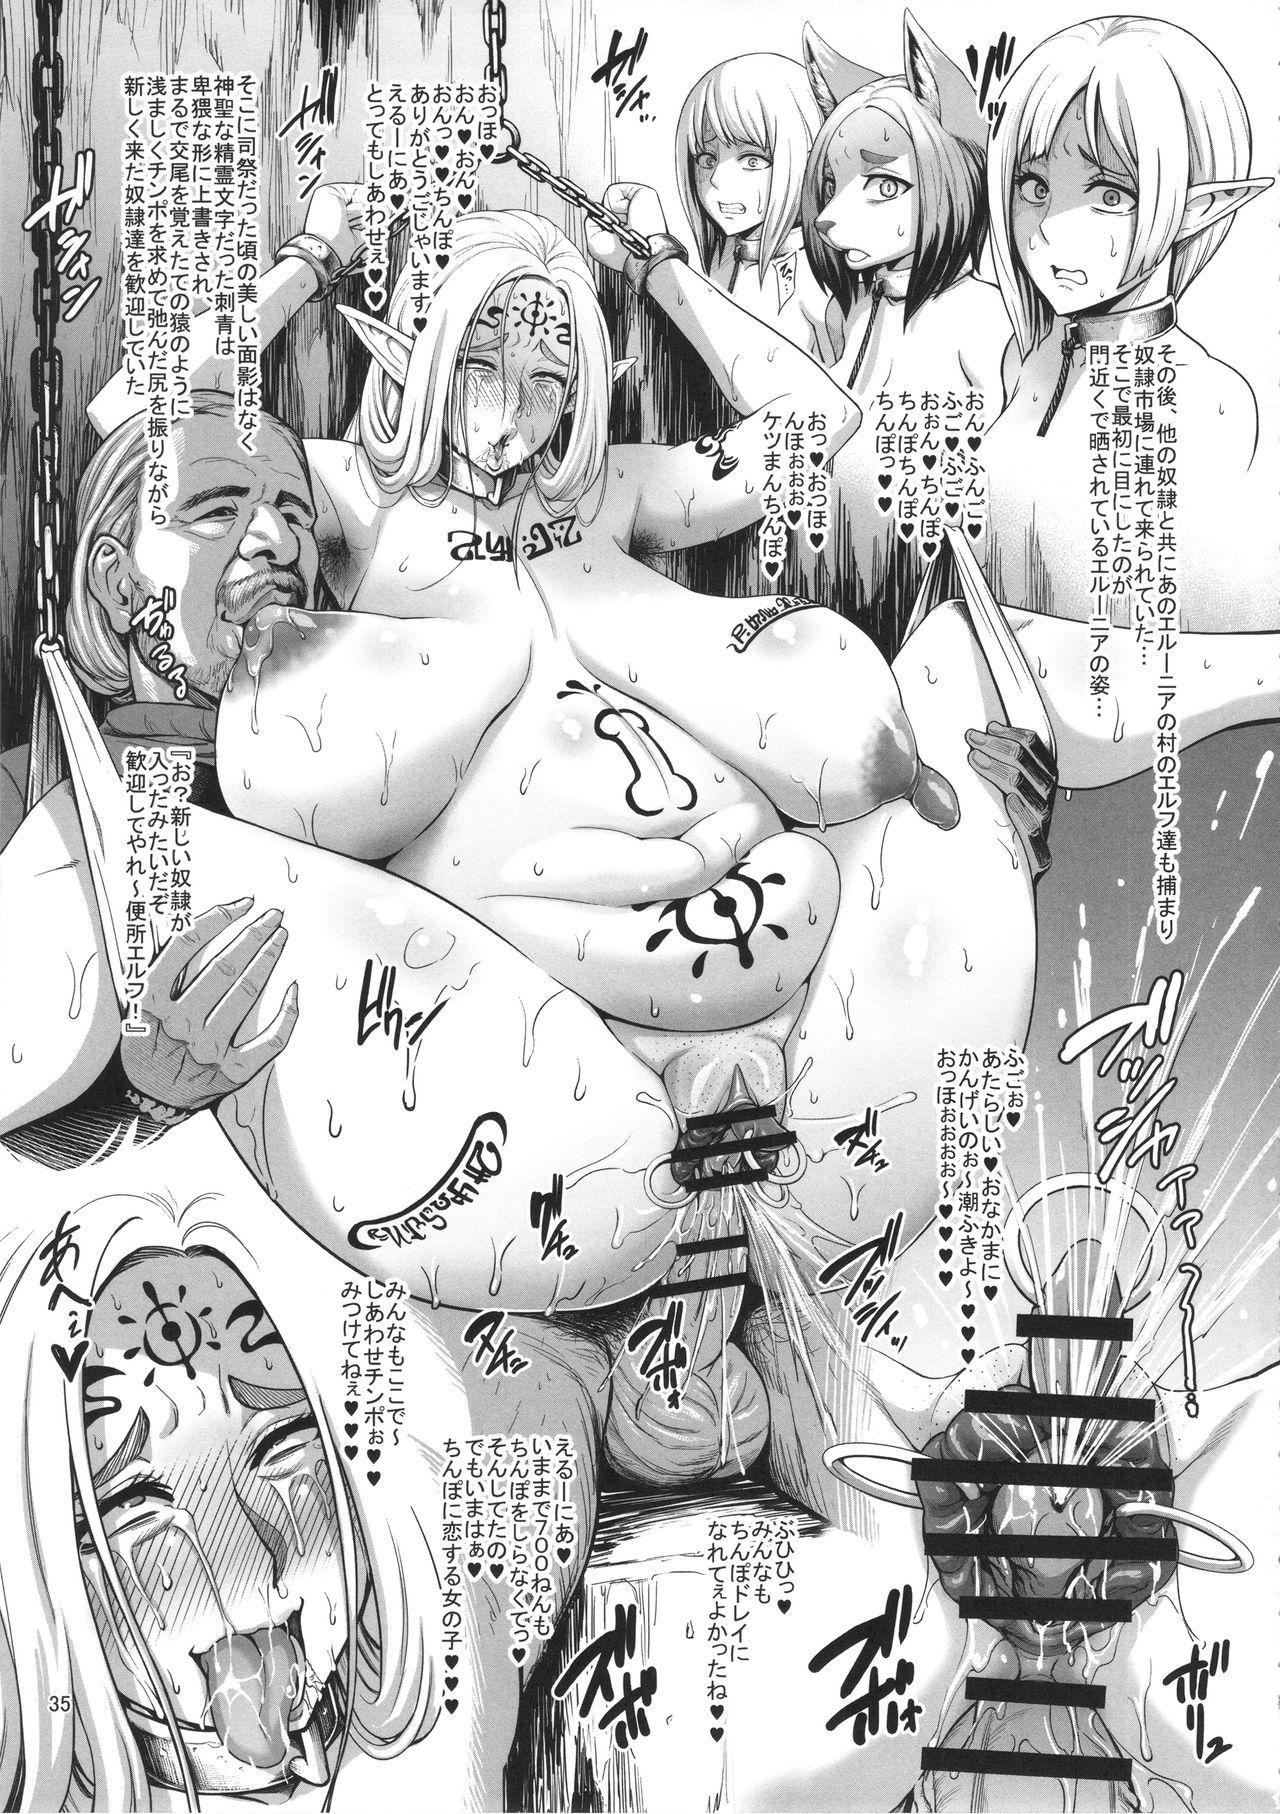 Omake no Matome + α 35